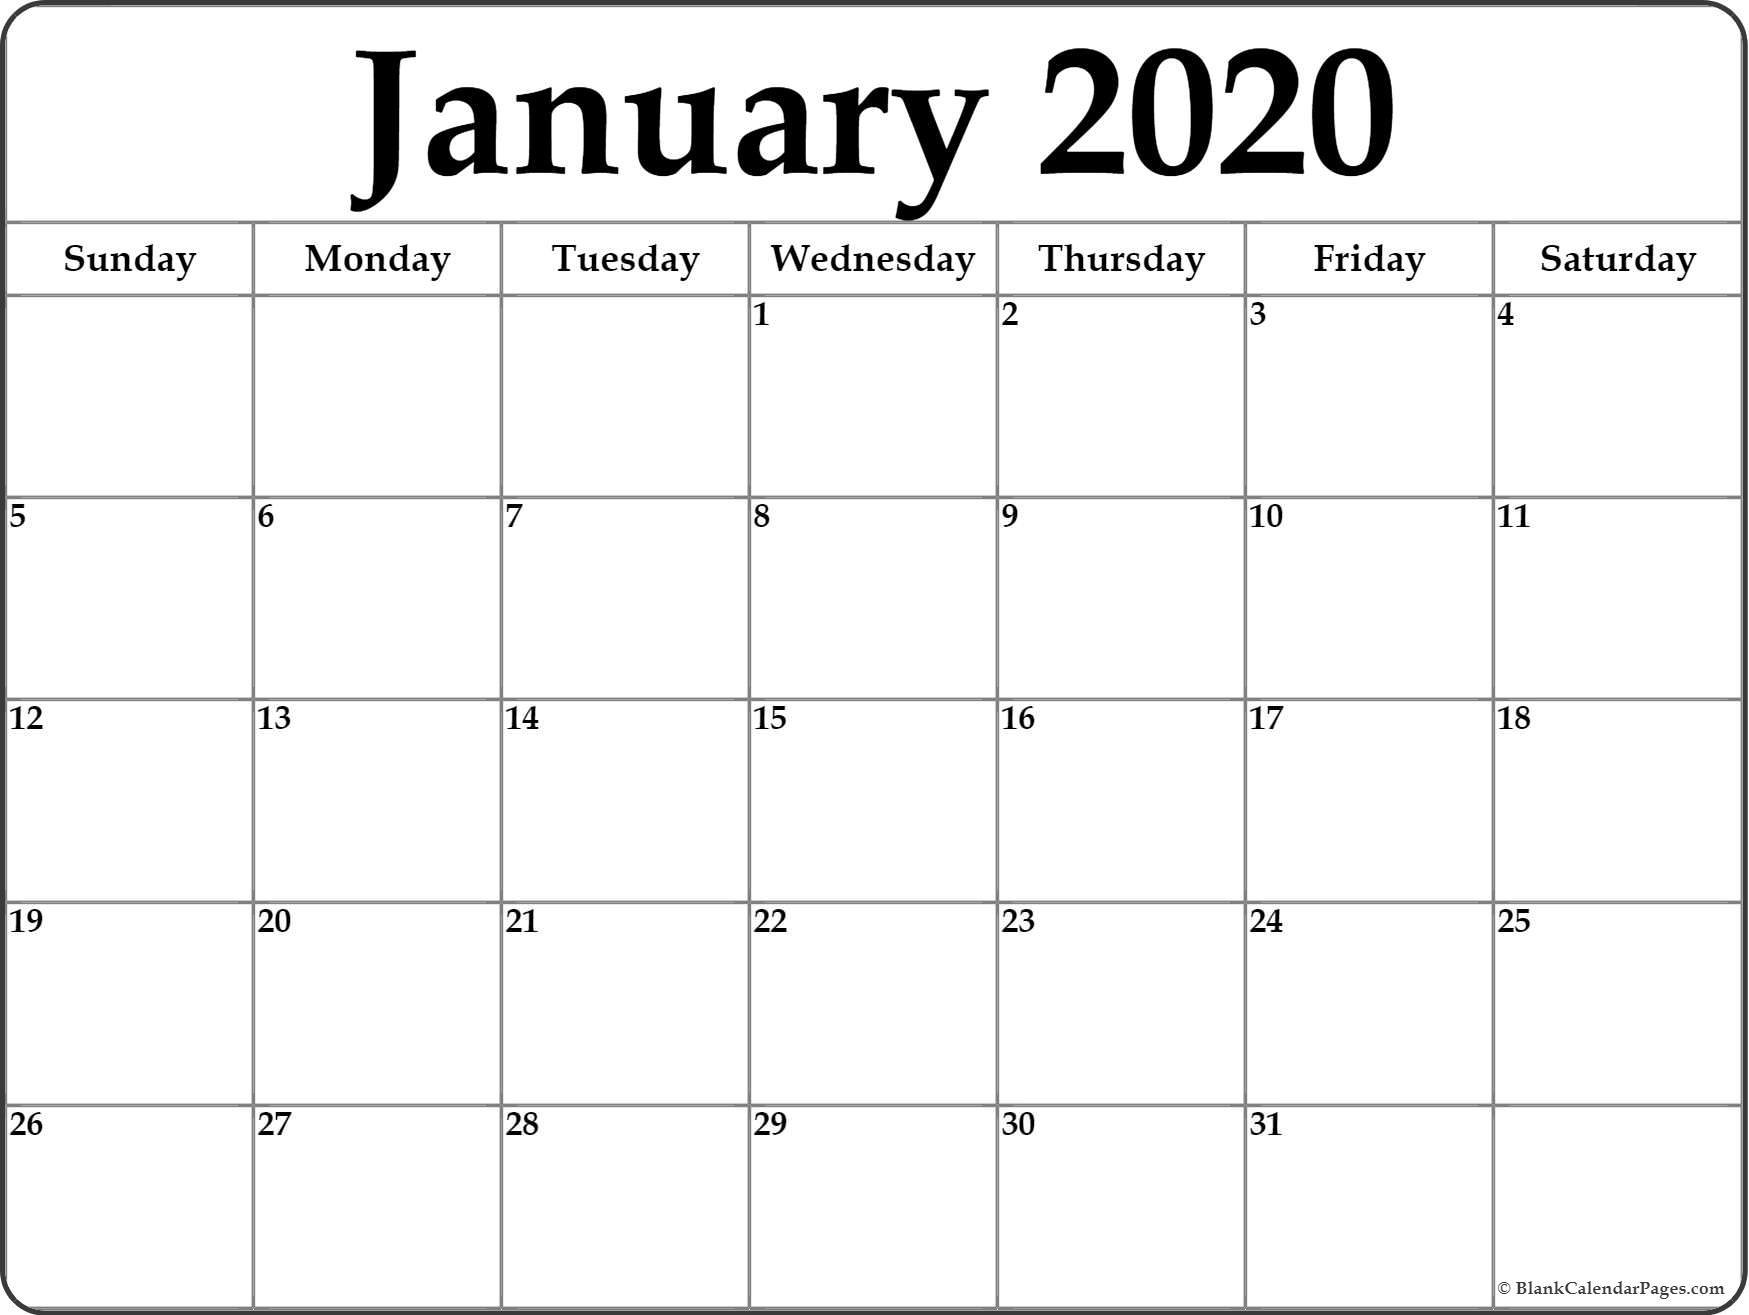 January 2020 Calendar   Free Printable Monthly Calendars-Blank 2020 Calendar Printable 2 Month